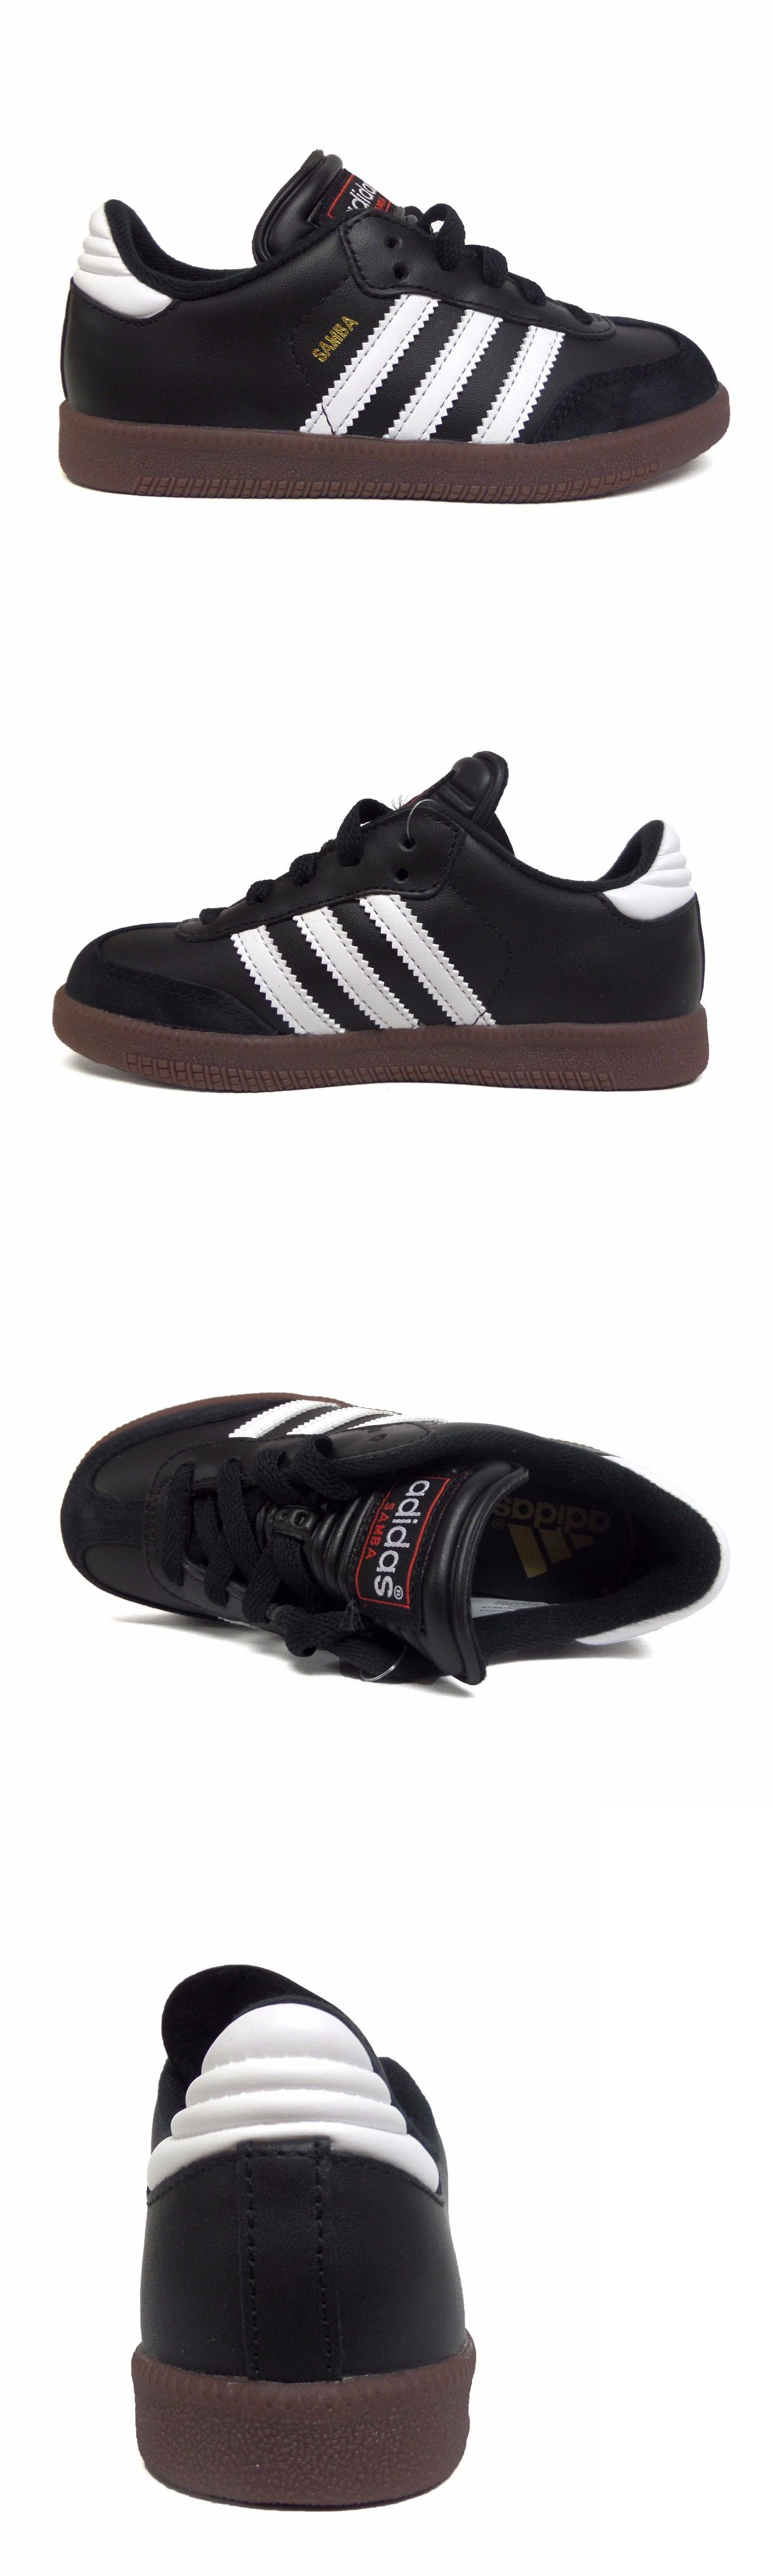 145c29394 ... reduced youth 159177 adidas kids preschool samba classic j indoor  soccer shoes black 036516 a1 dd50c